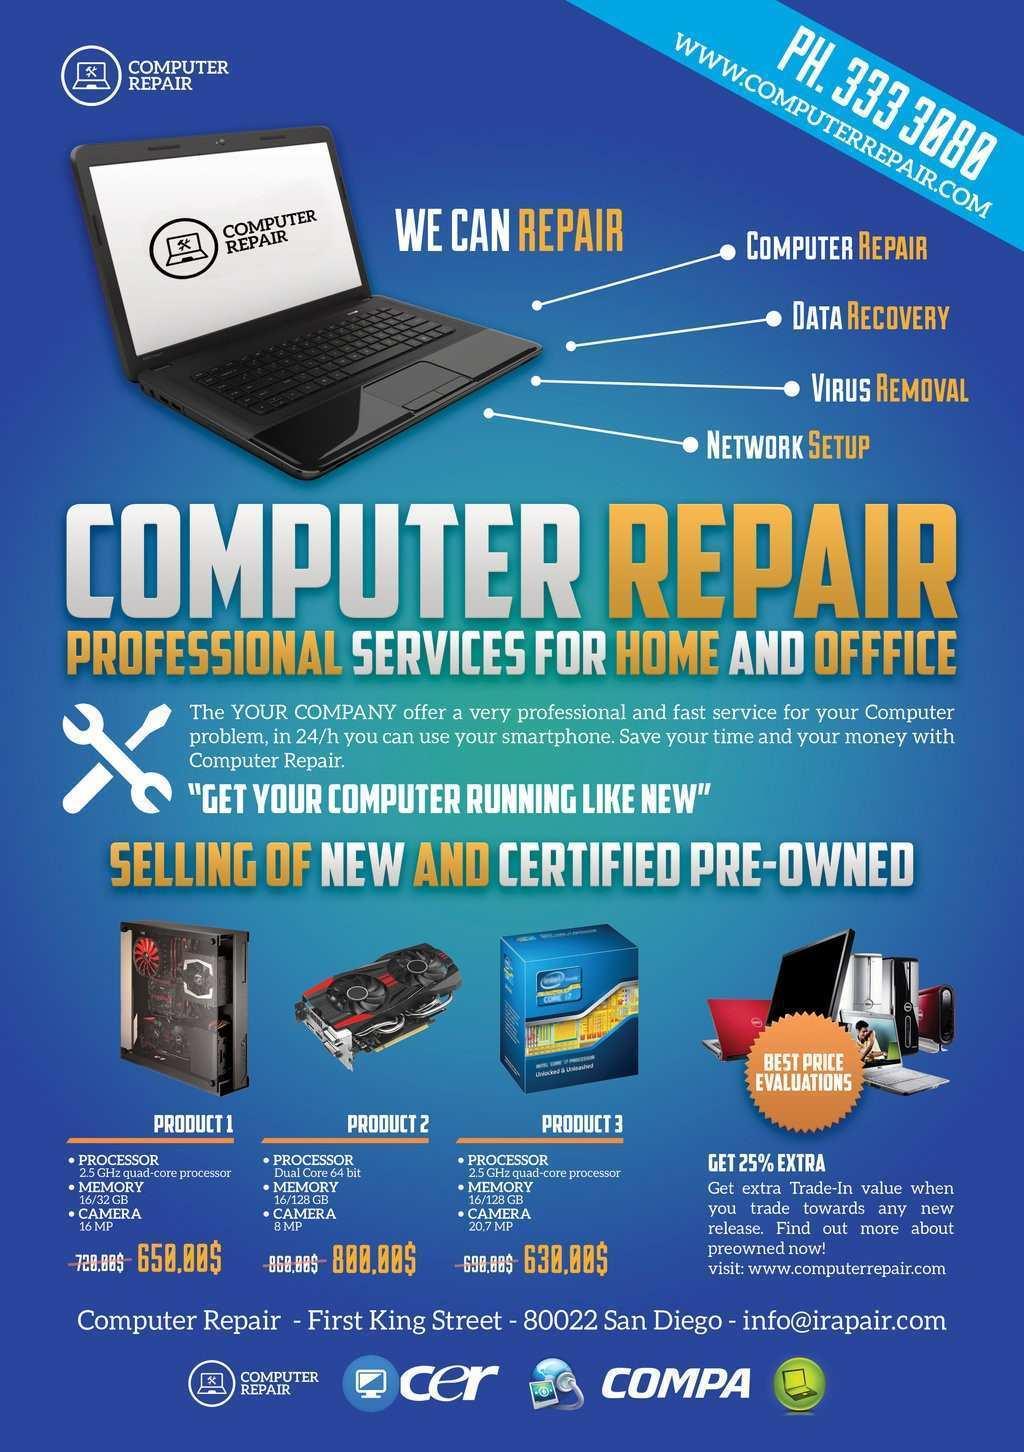 43 Report Computer Repair Flyer Template Word Templates by Computer Repair Flyer Template Word